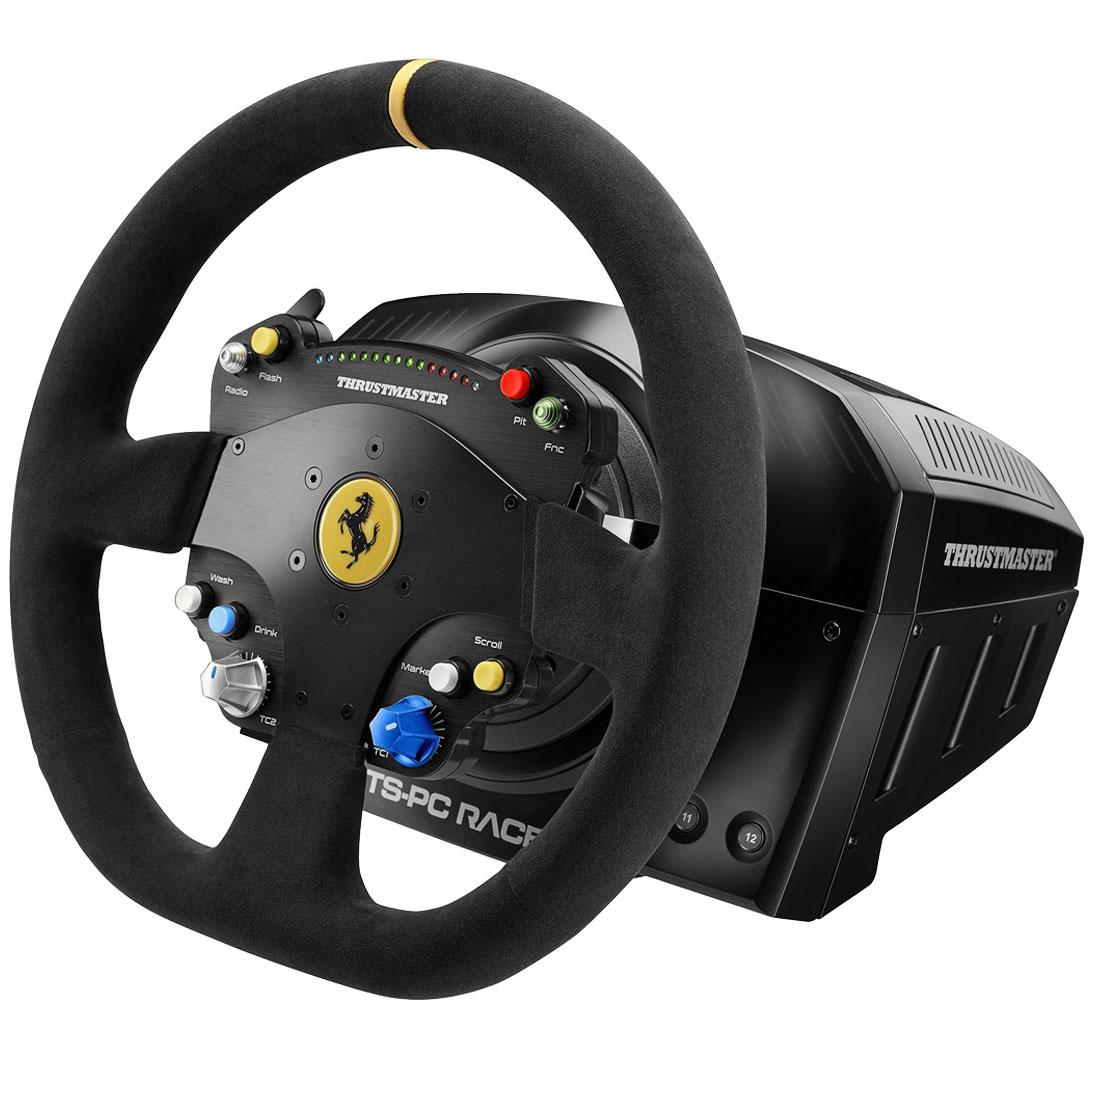 TS-PC RACER – FERRARI 488